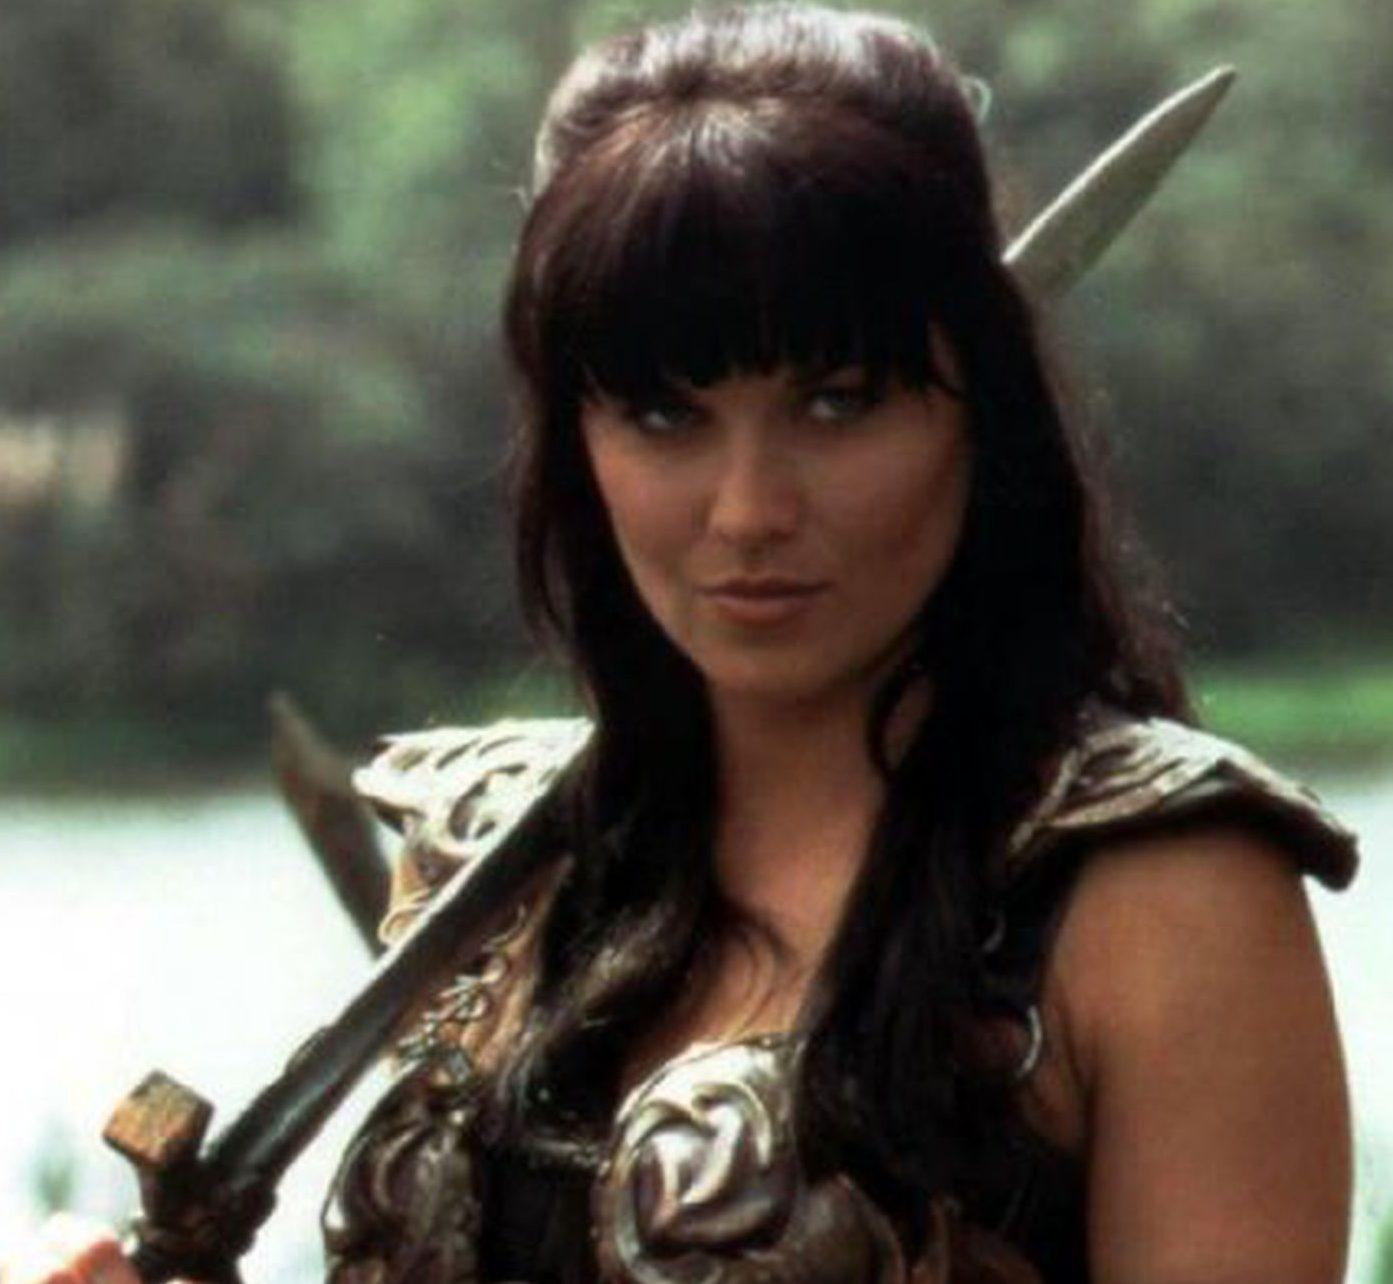 xena warrior princess vibe.0.0 1 e1617005044893 20 Things You Never Knew About Xena: Warrior Princess